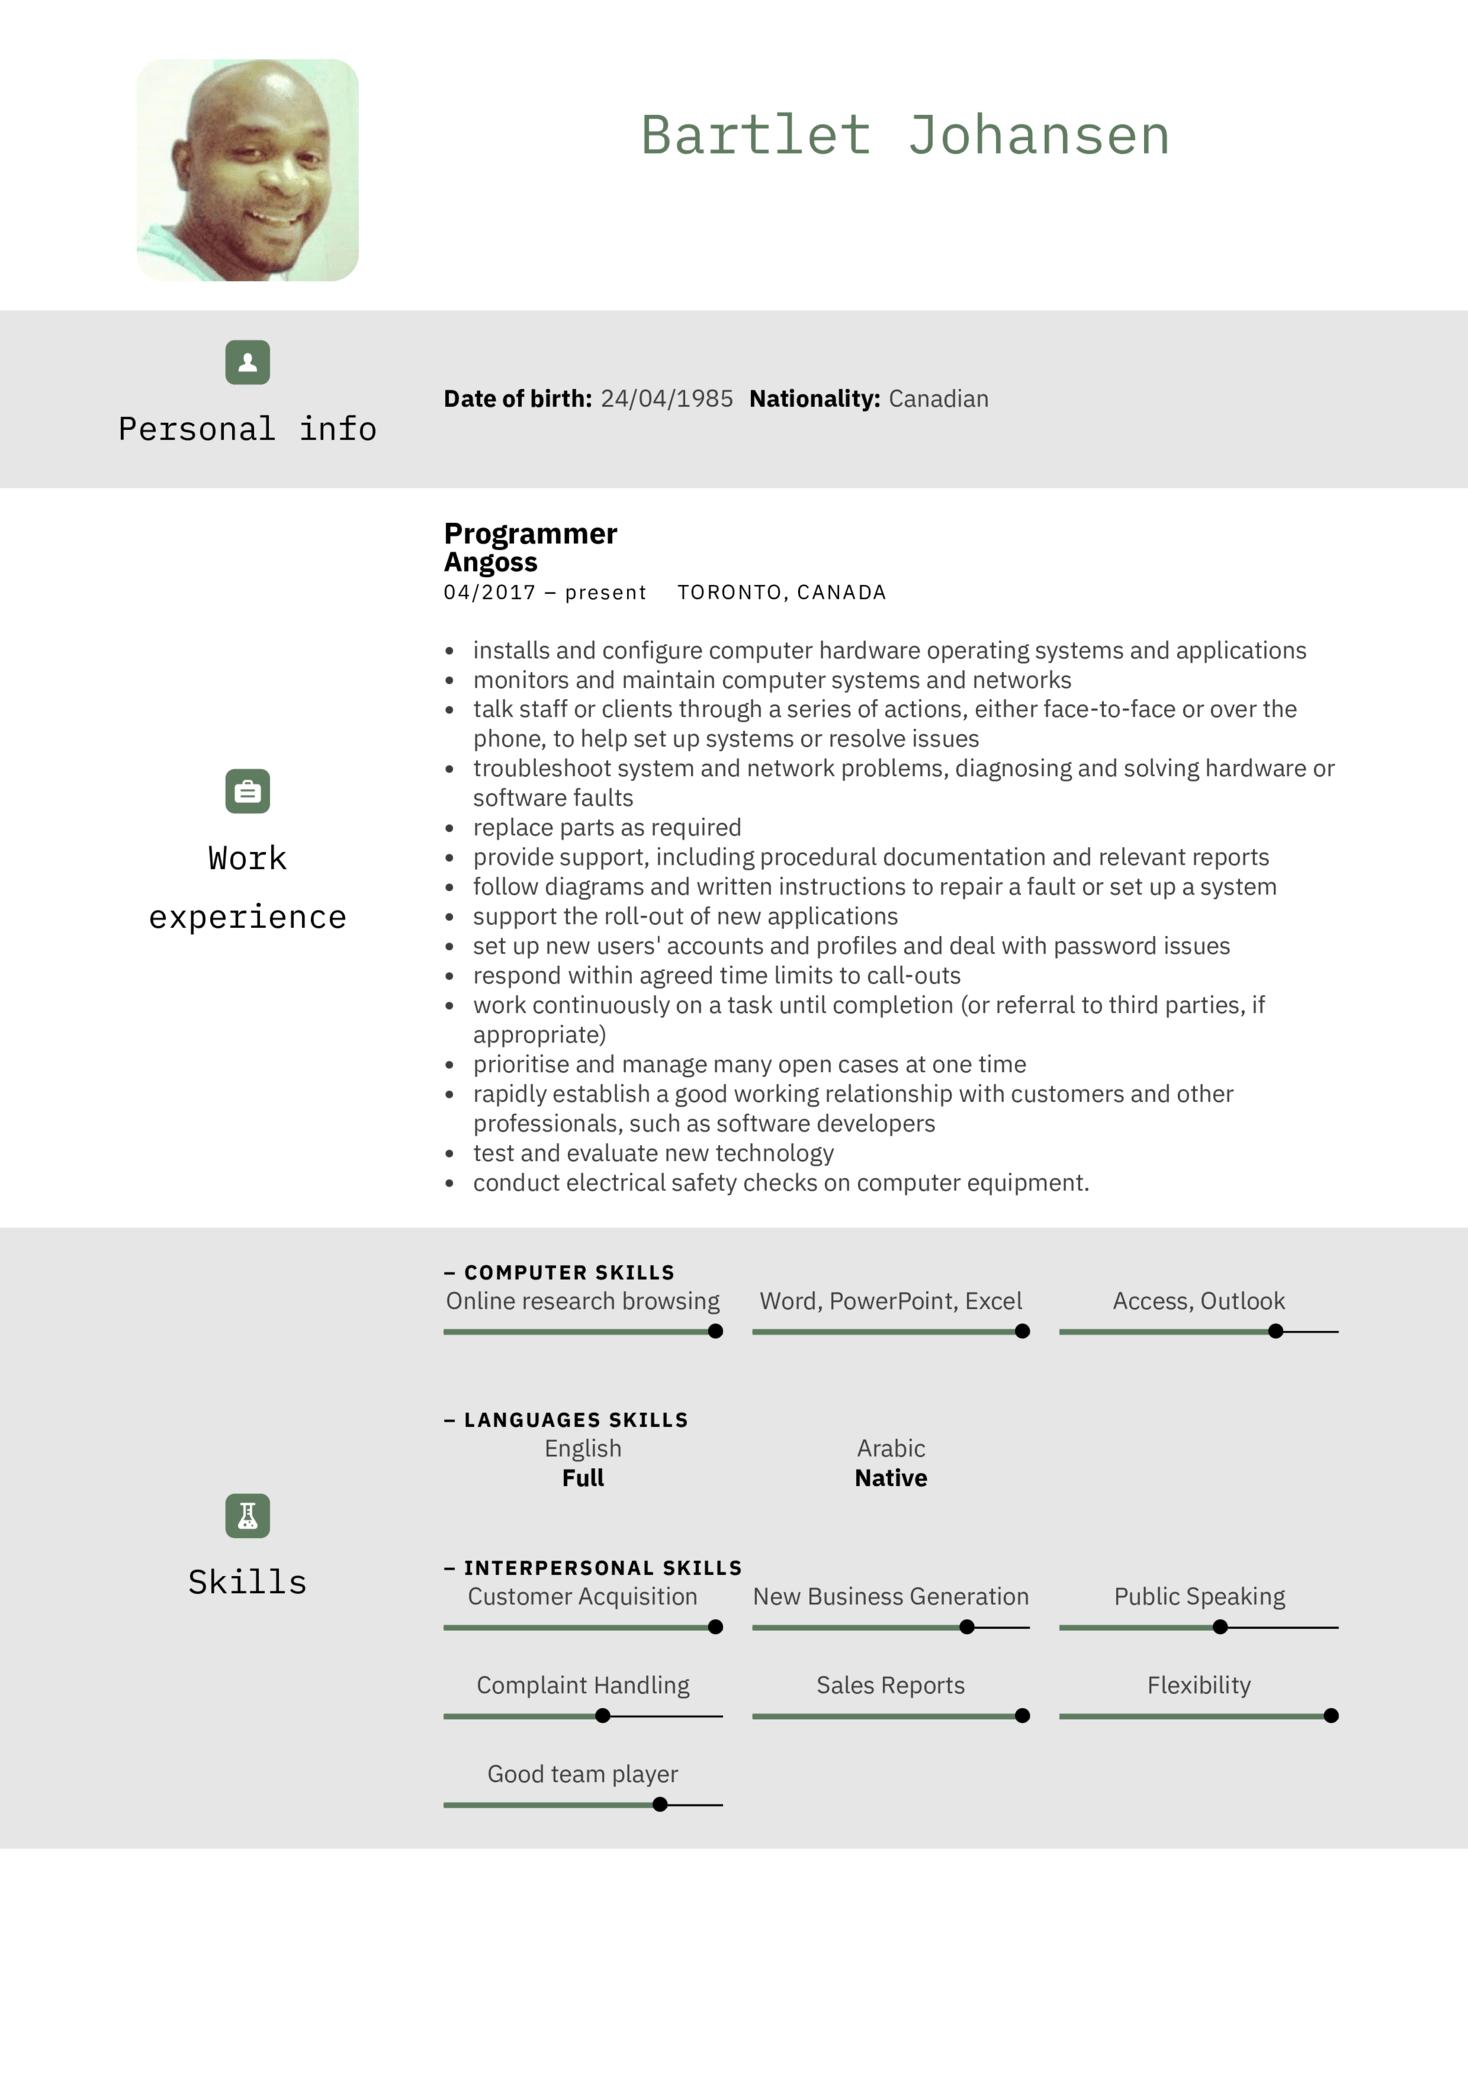 IBM IT Support Specialist Resume Example (Parte 1)